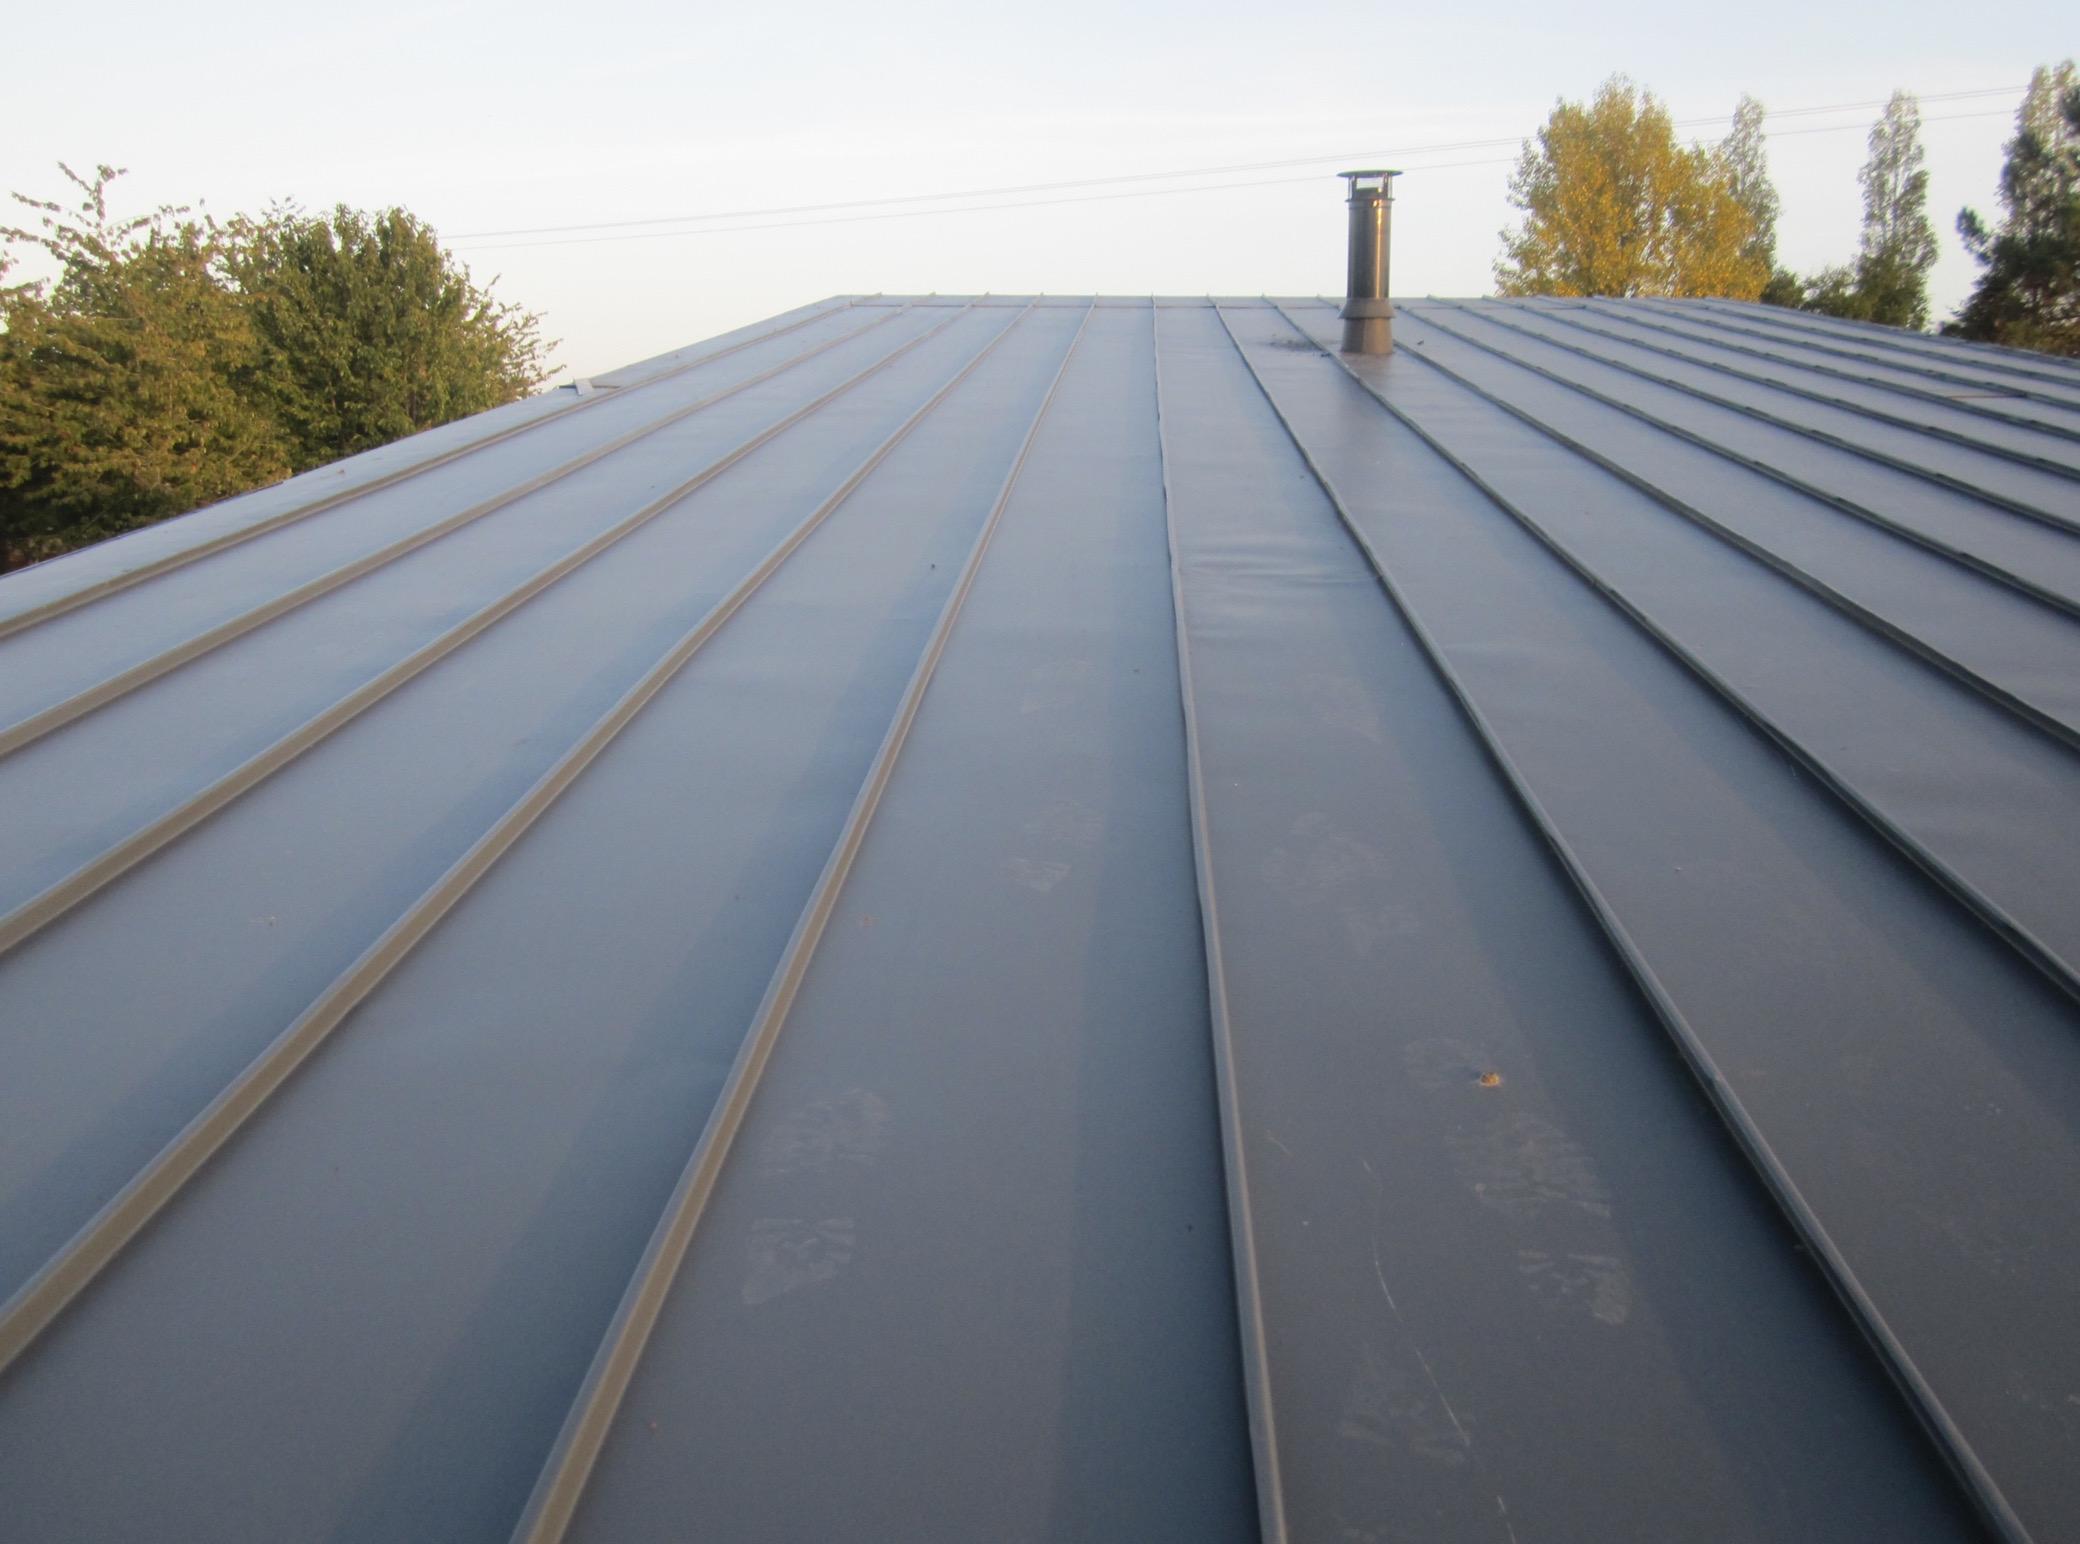 Pente toiture provence forum pour construire et rnover for Toiture terrasse pente